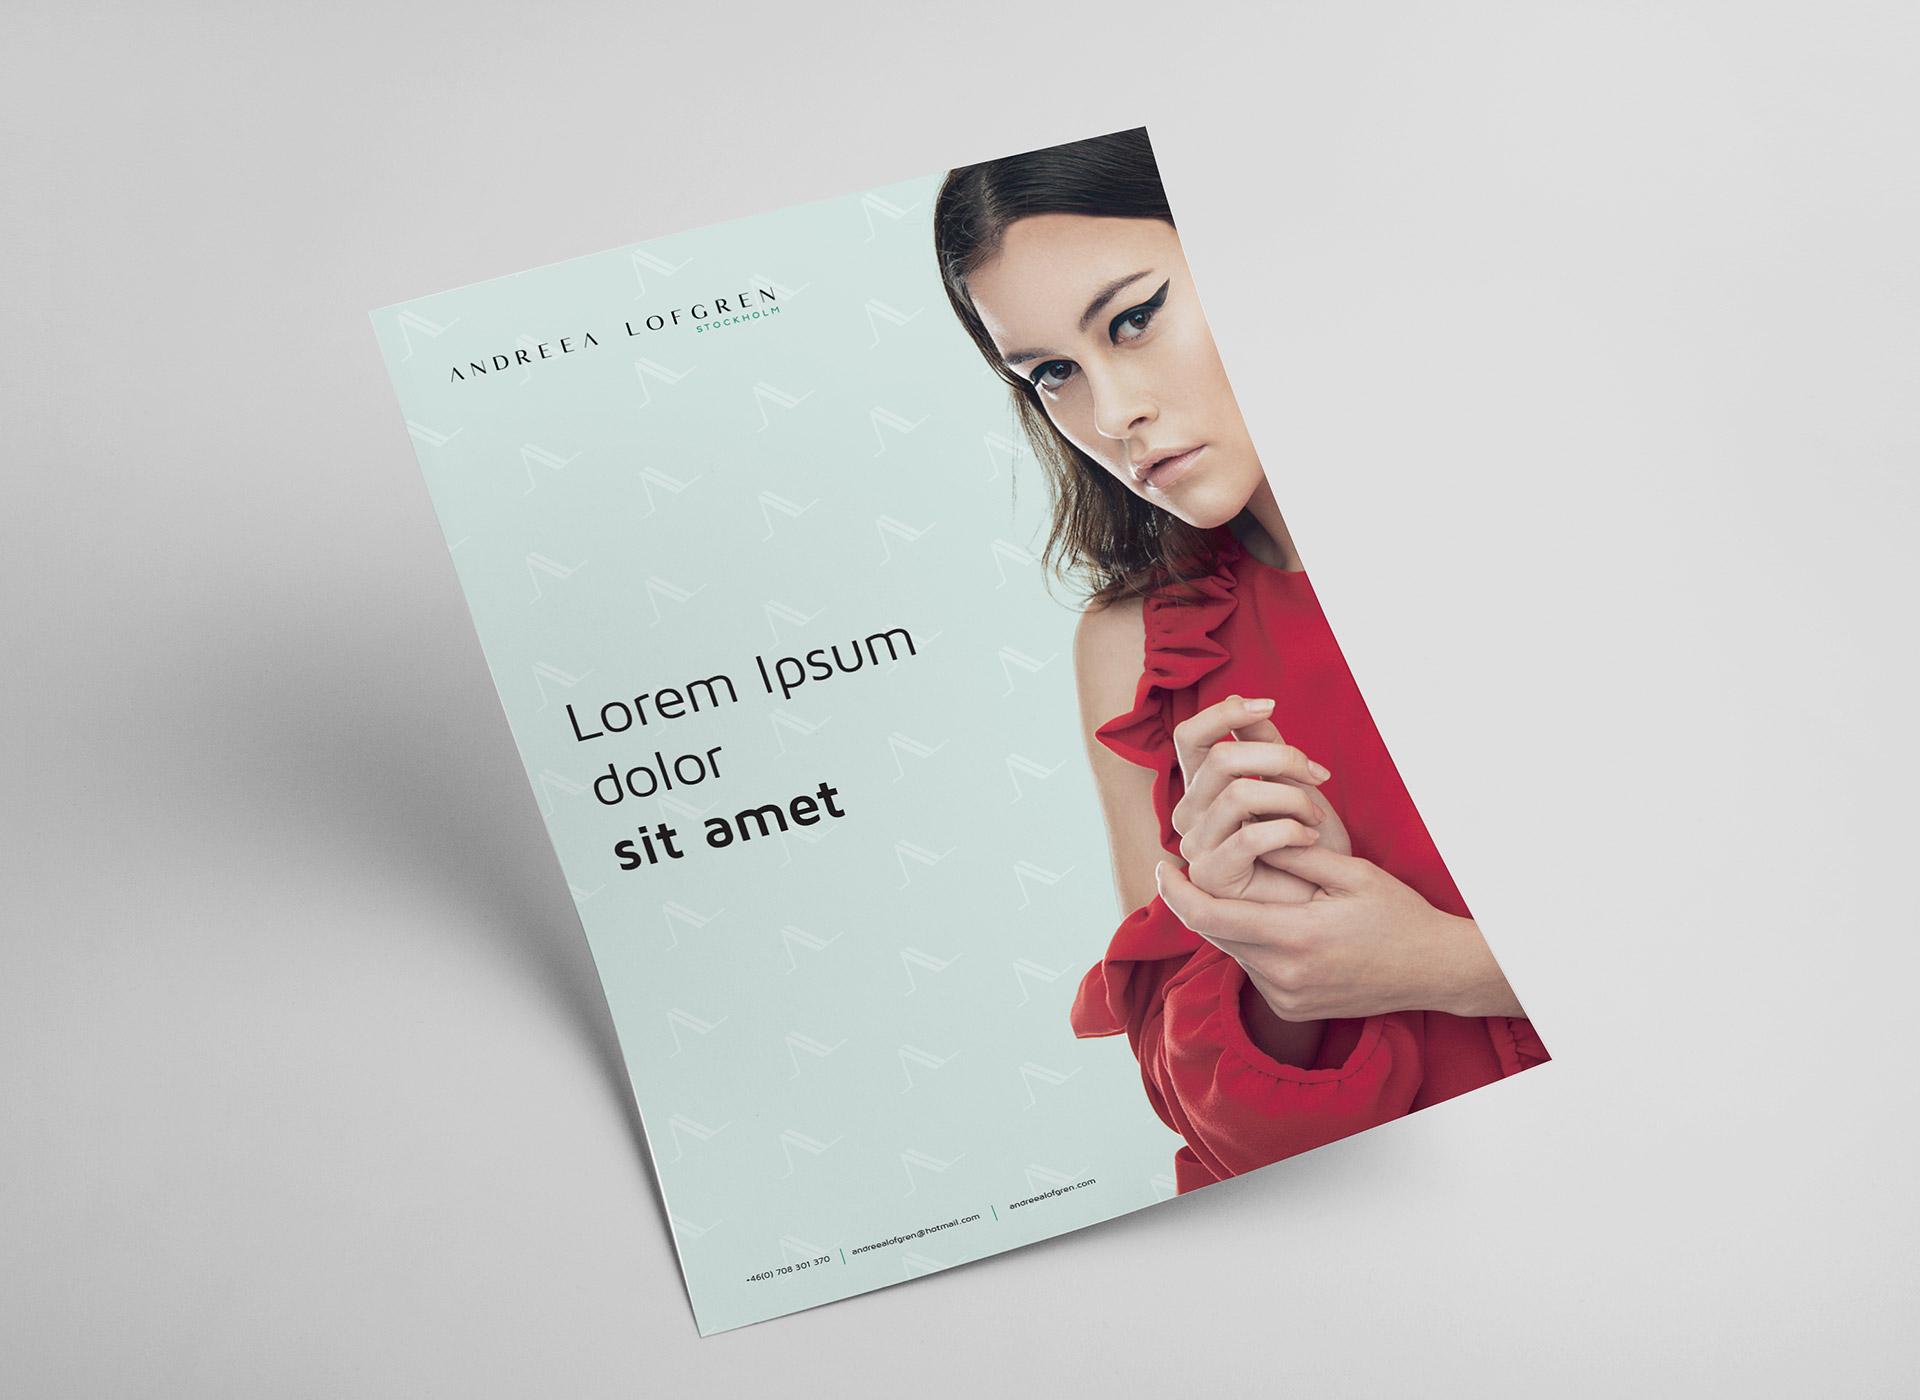 Andreea Lofgren portfolio inoveo poster